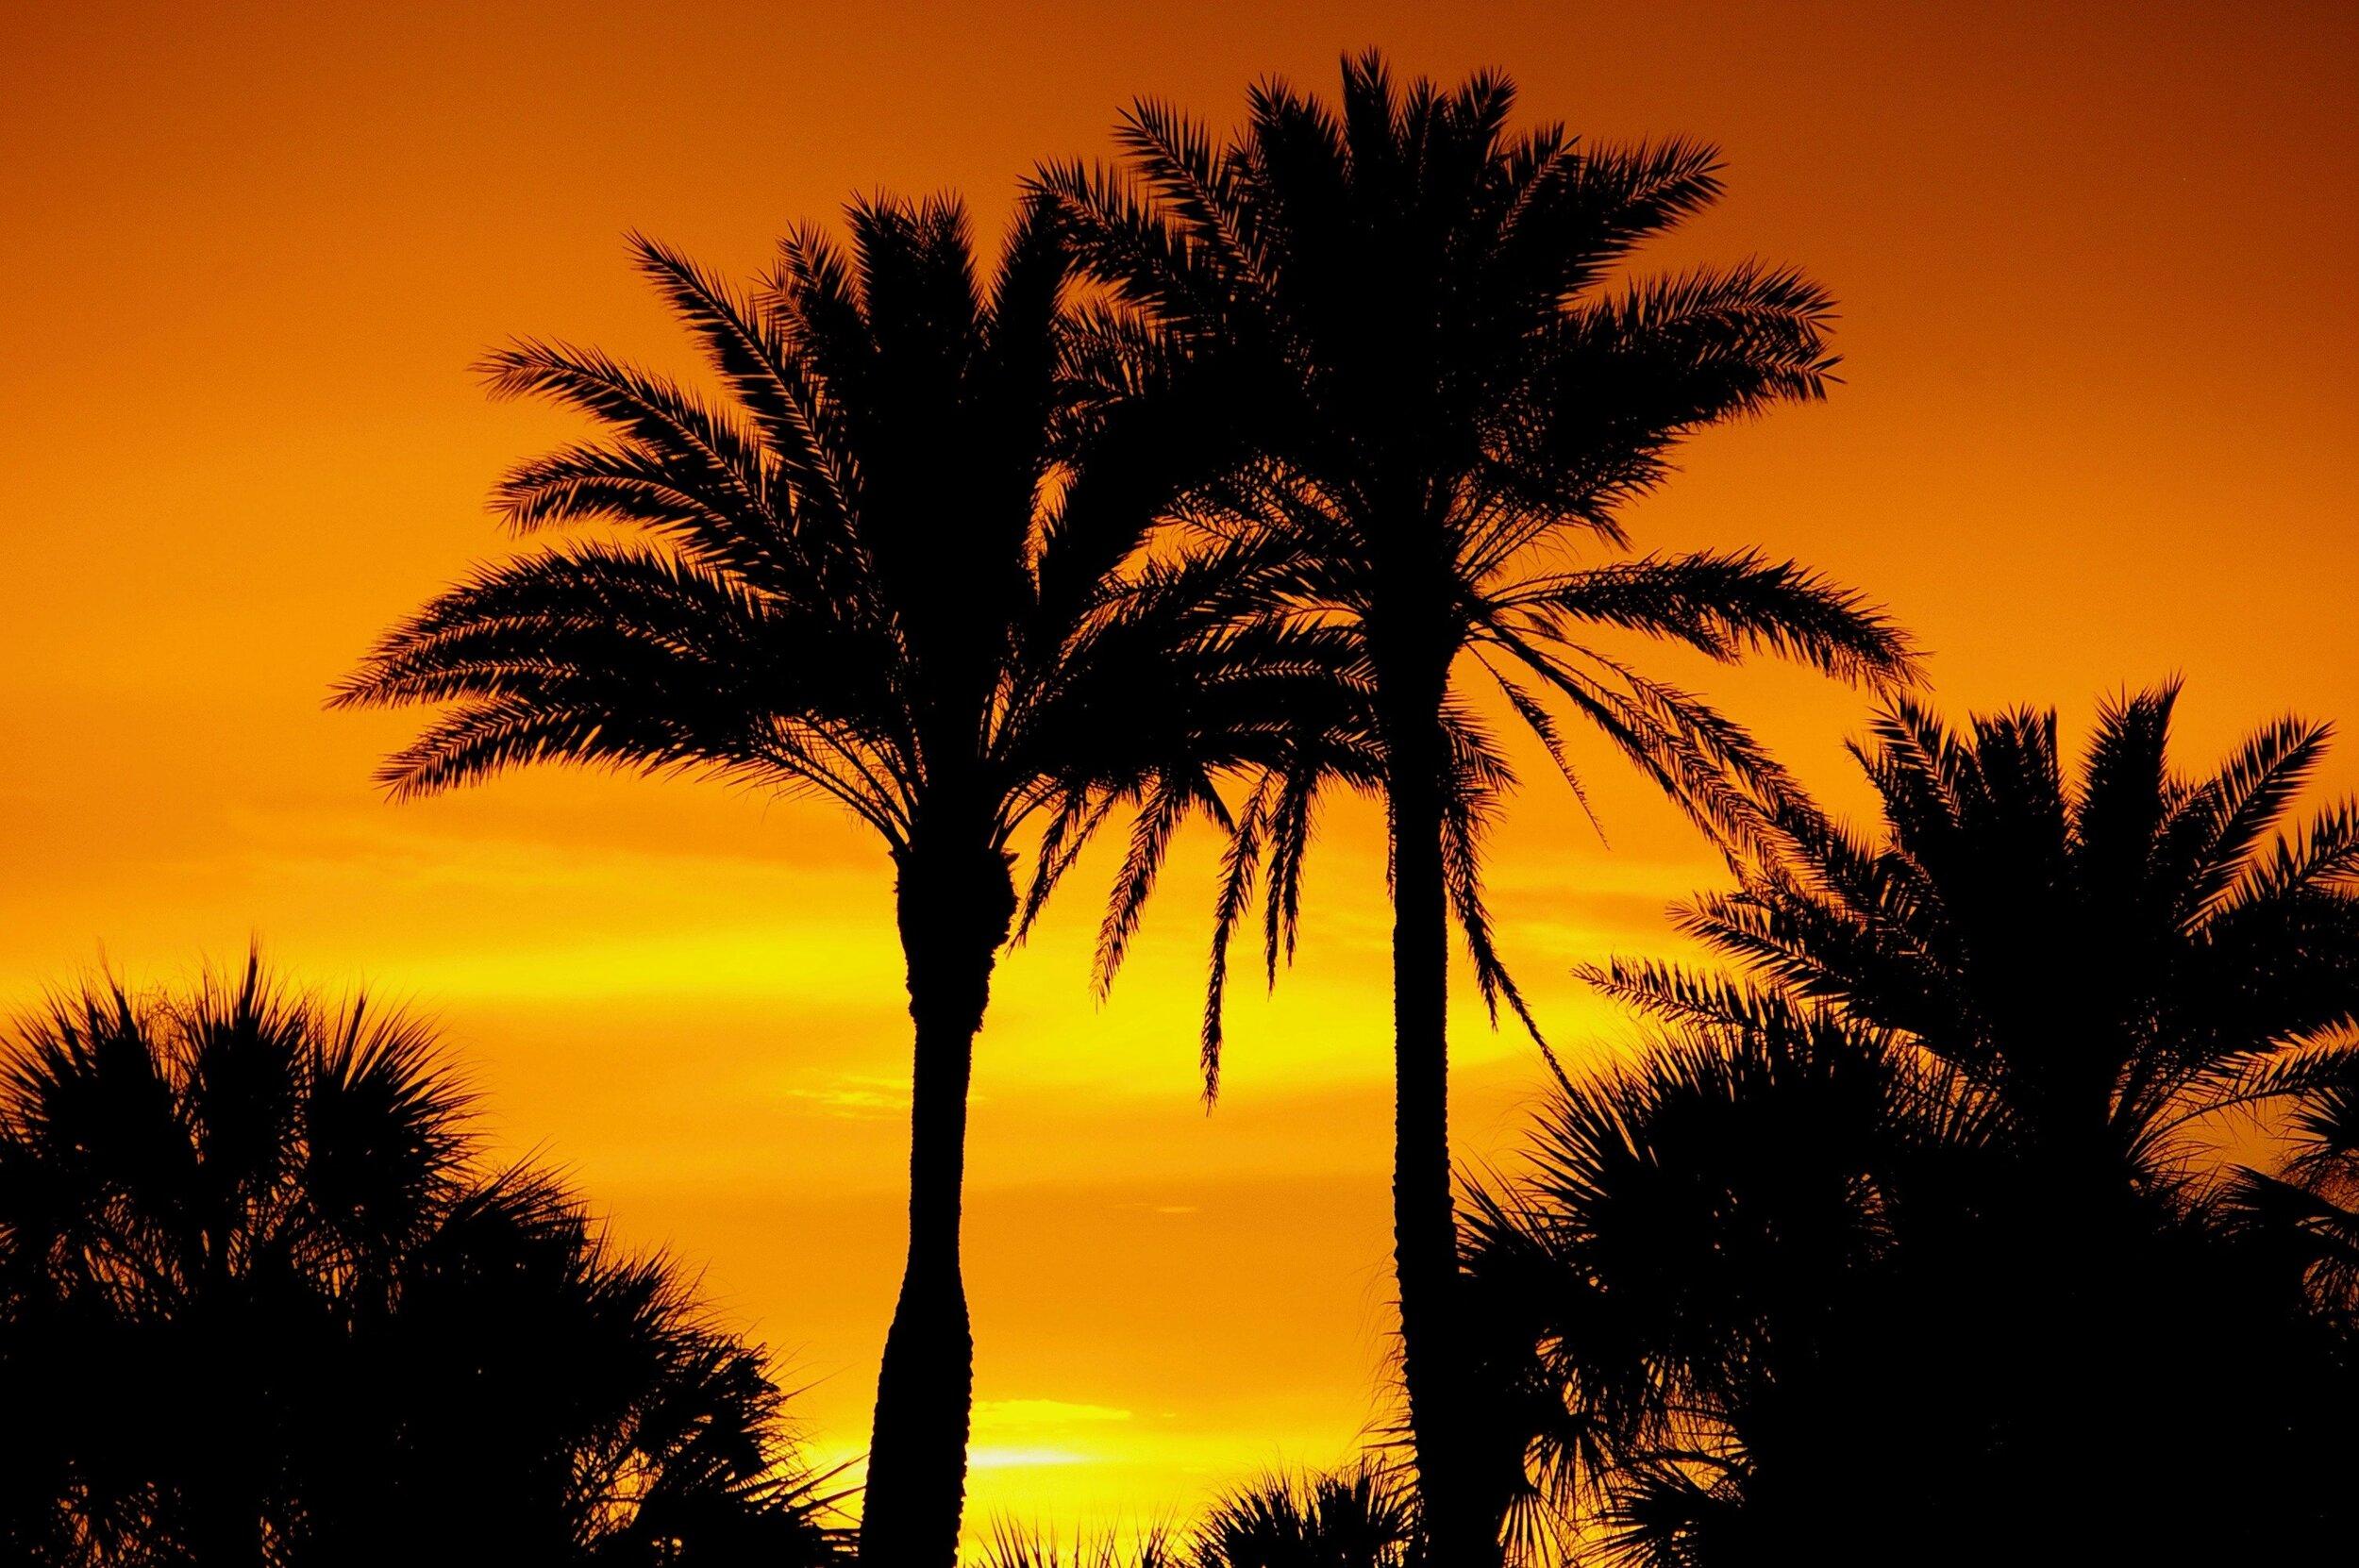 afterglow-coconut-trees-dawn-2594992.jpg